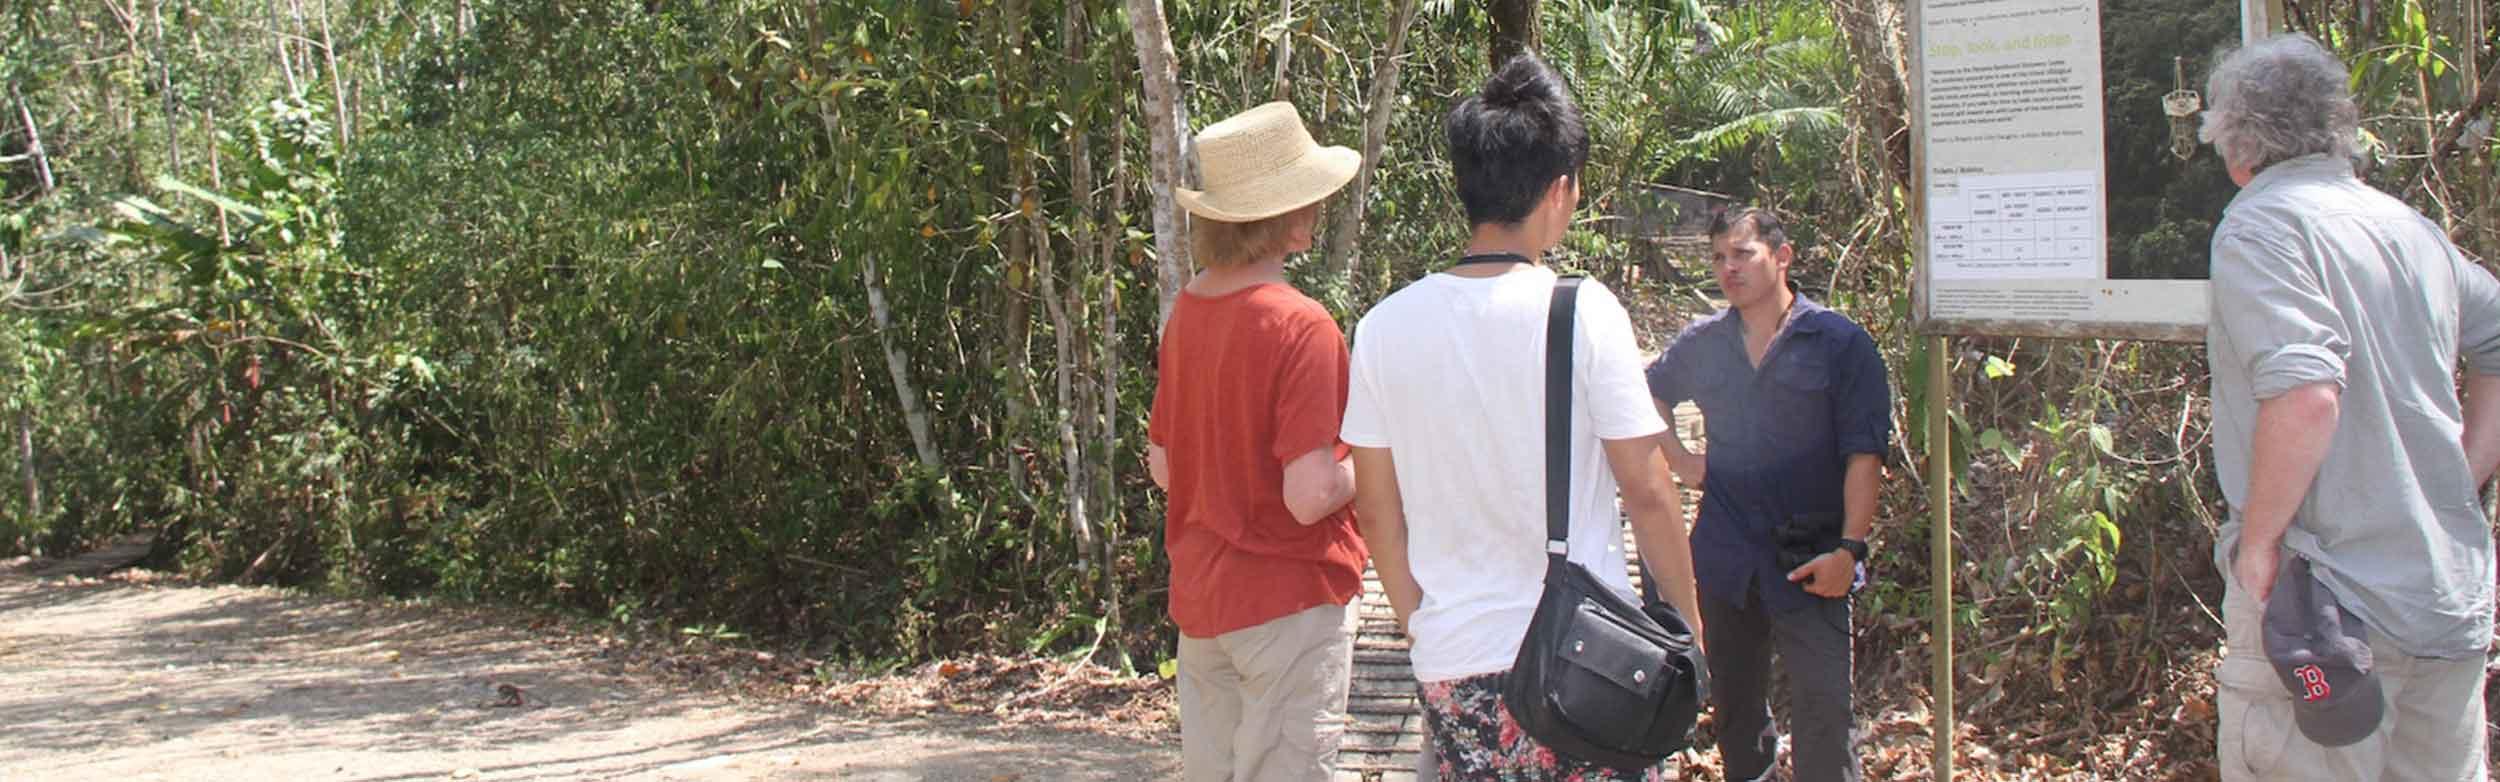 Hiking Soberania National Park & Jungle Boat Tour